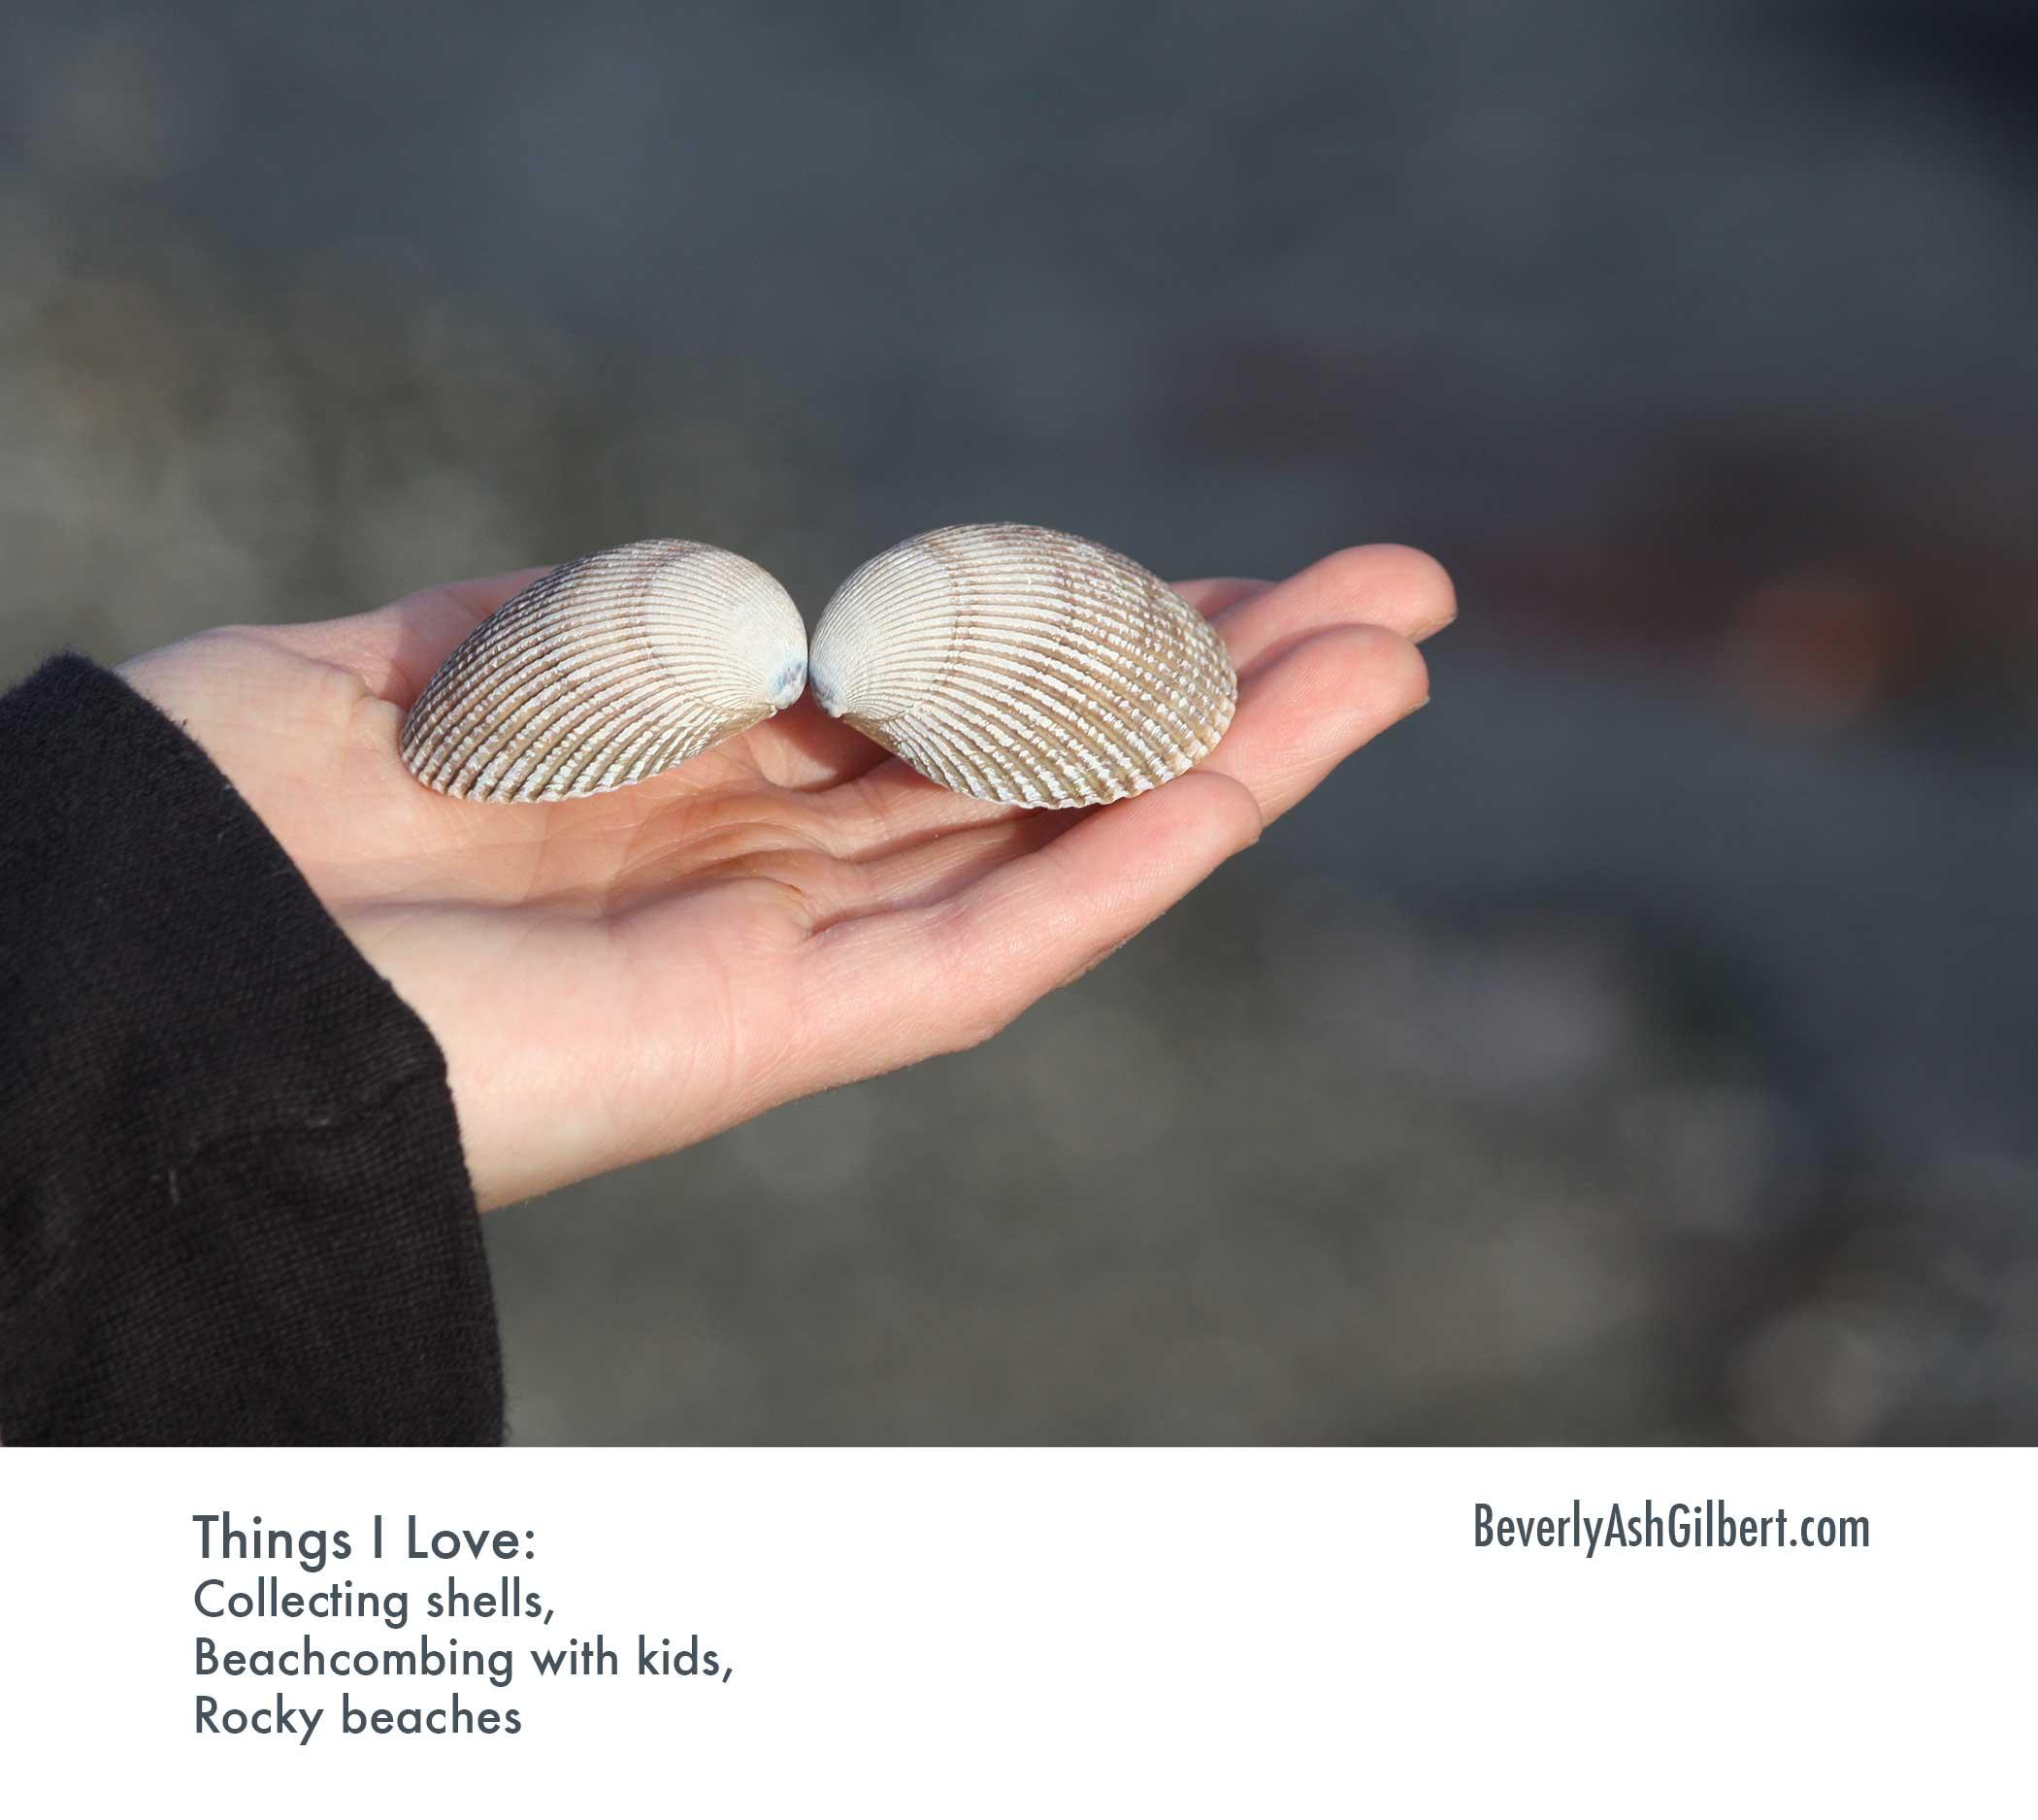 ThingsILove_Collecting-shells.jpg